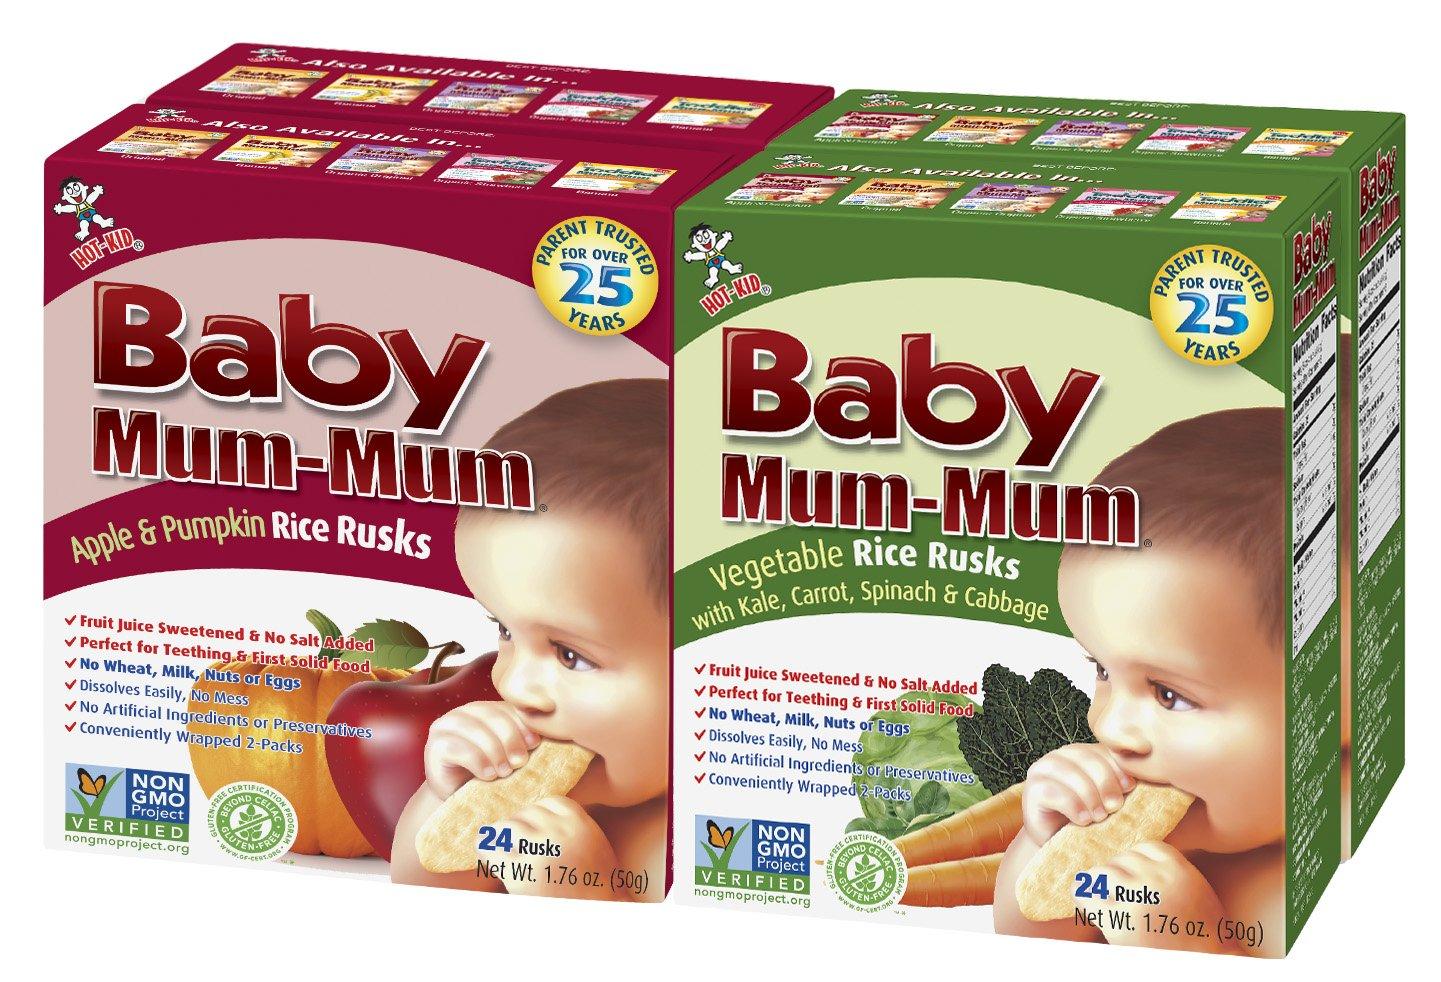 Hot-Kid Baby Mum-Mum Rice Rusks, 2 Flavor Variety Pack, 24 Pieces (Pack of 4) 2 Each: Apple & Pumpkin, Vegetable Gluten Free, Allergen Free, Non-GMO, Rice Teether Cookie